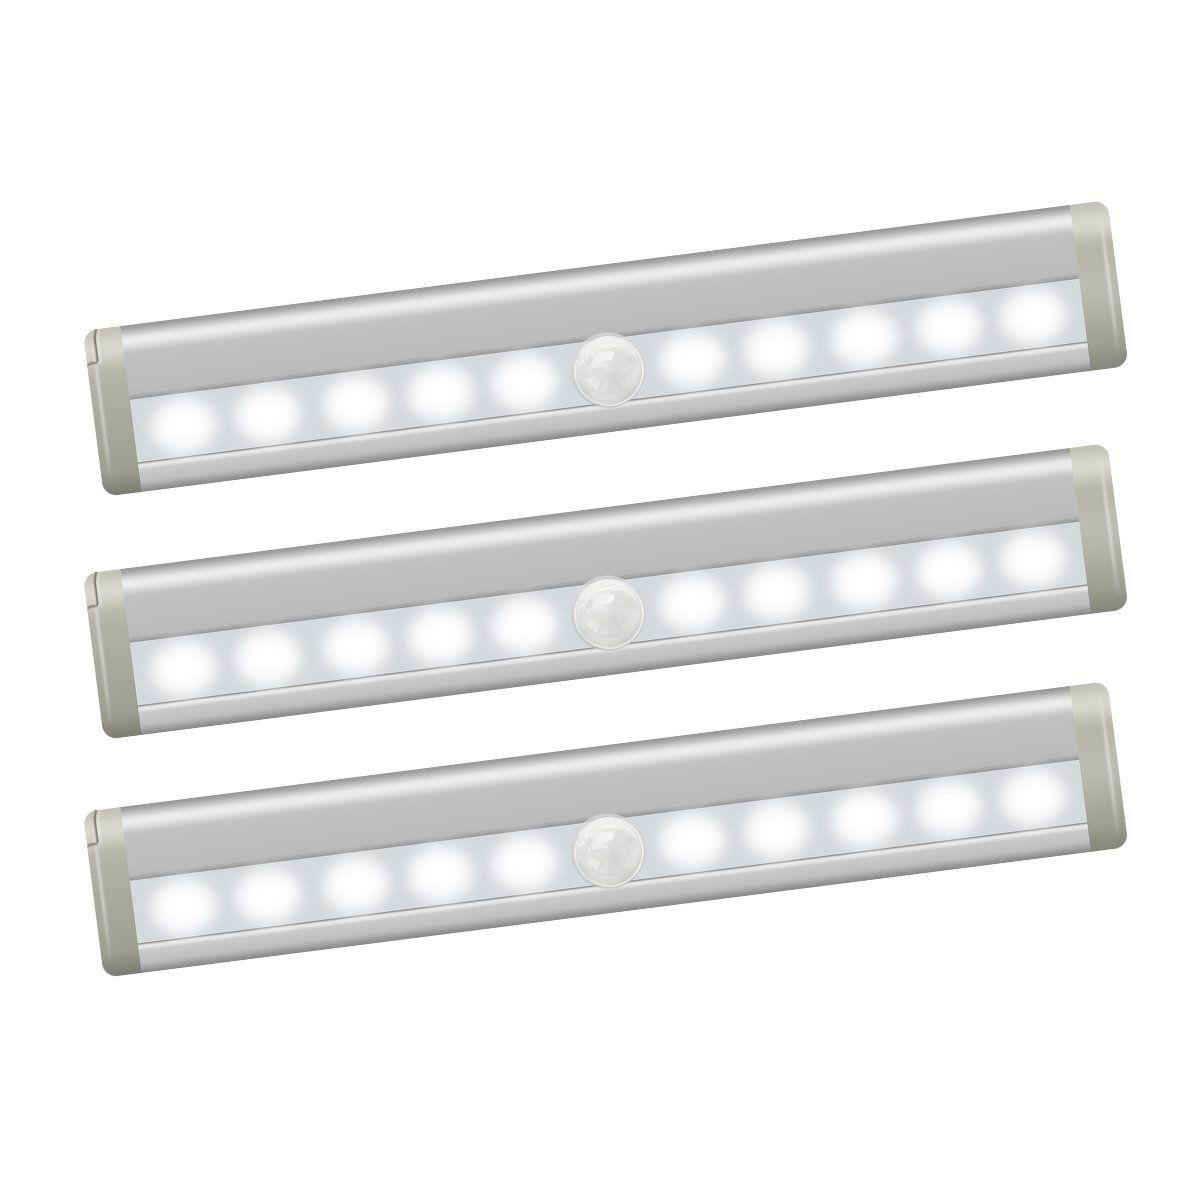 Closet Light, Motion Sensor Cabinet Light With Magnetic Strip Stick On  Anywhere Cordless LED Night